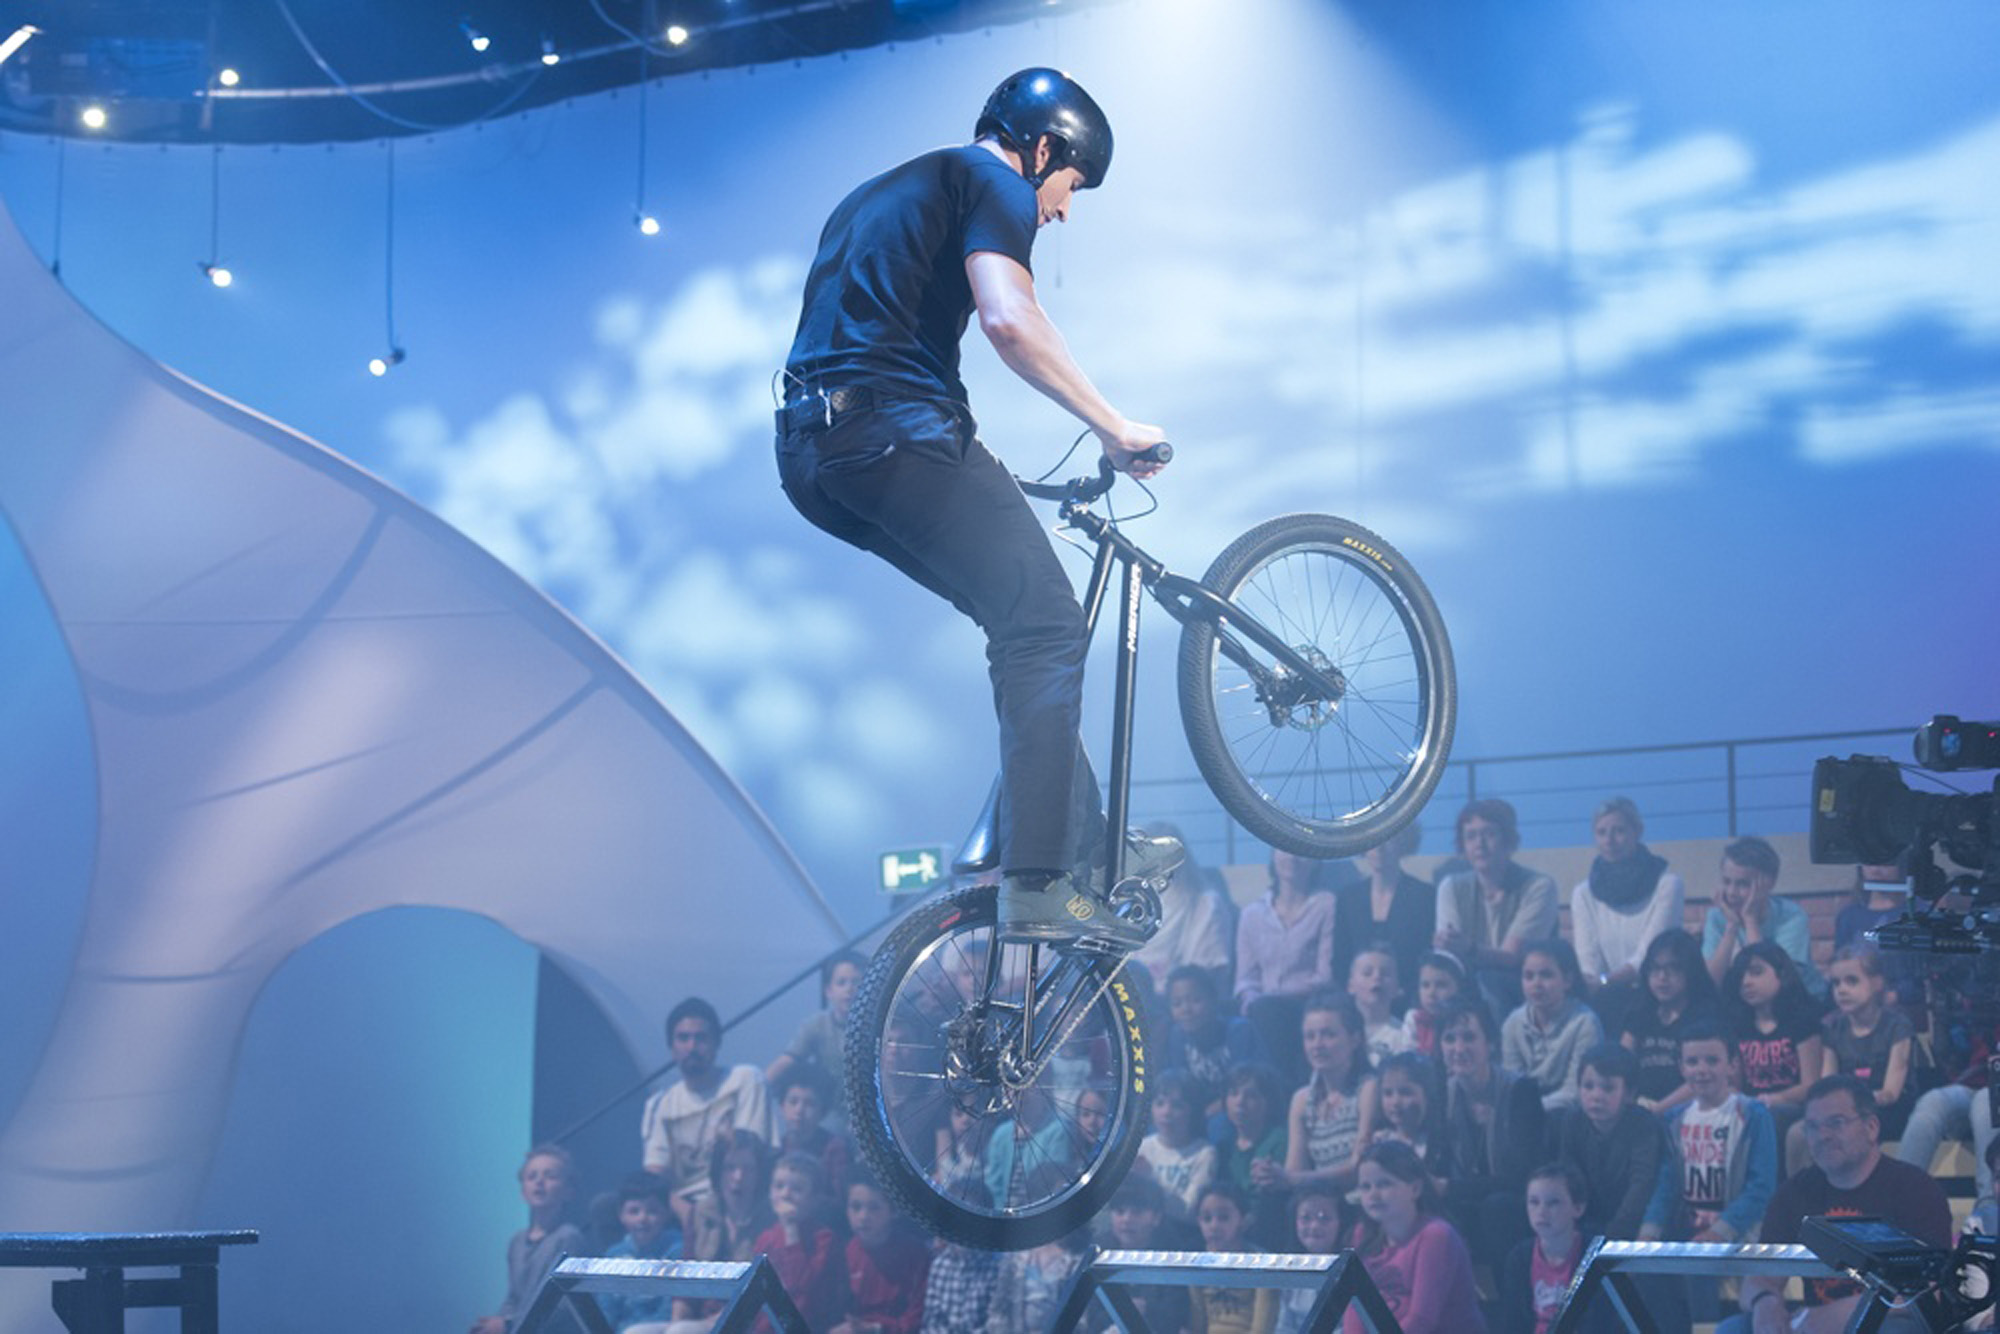 Dominik Raab springt am Hinterrad im Fernsehen